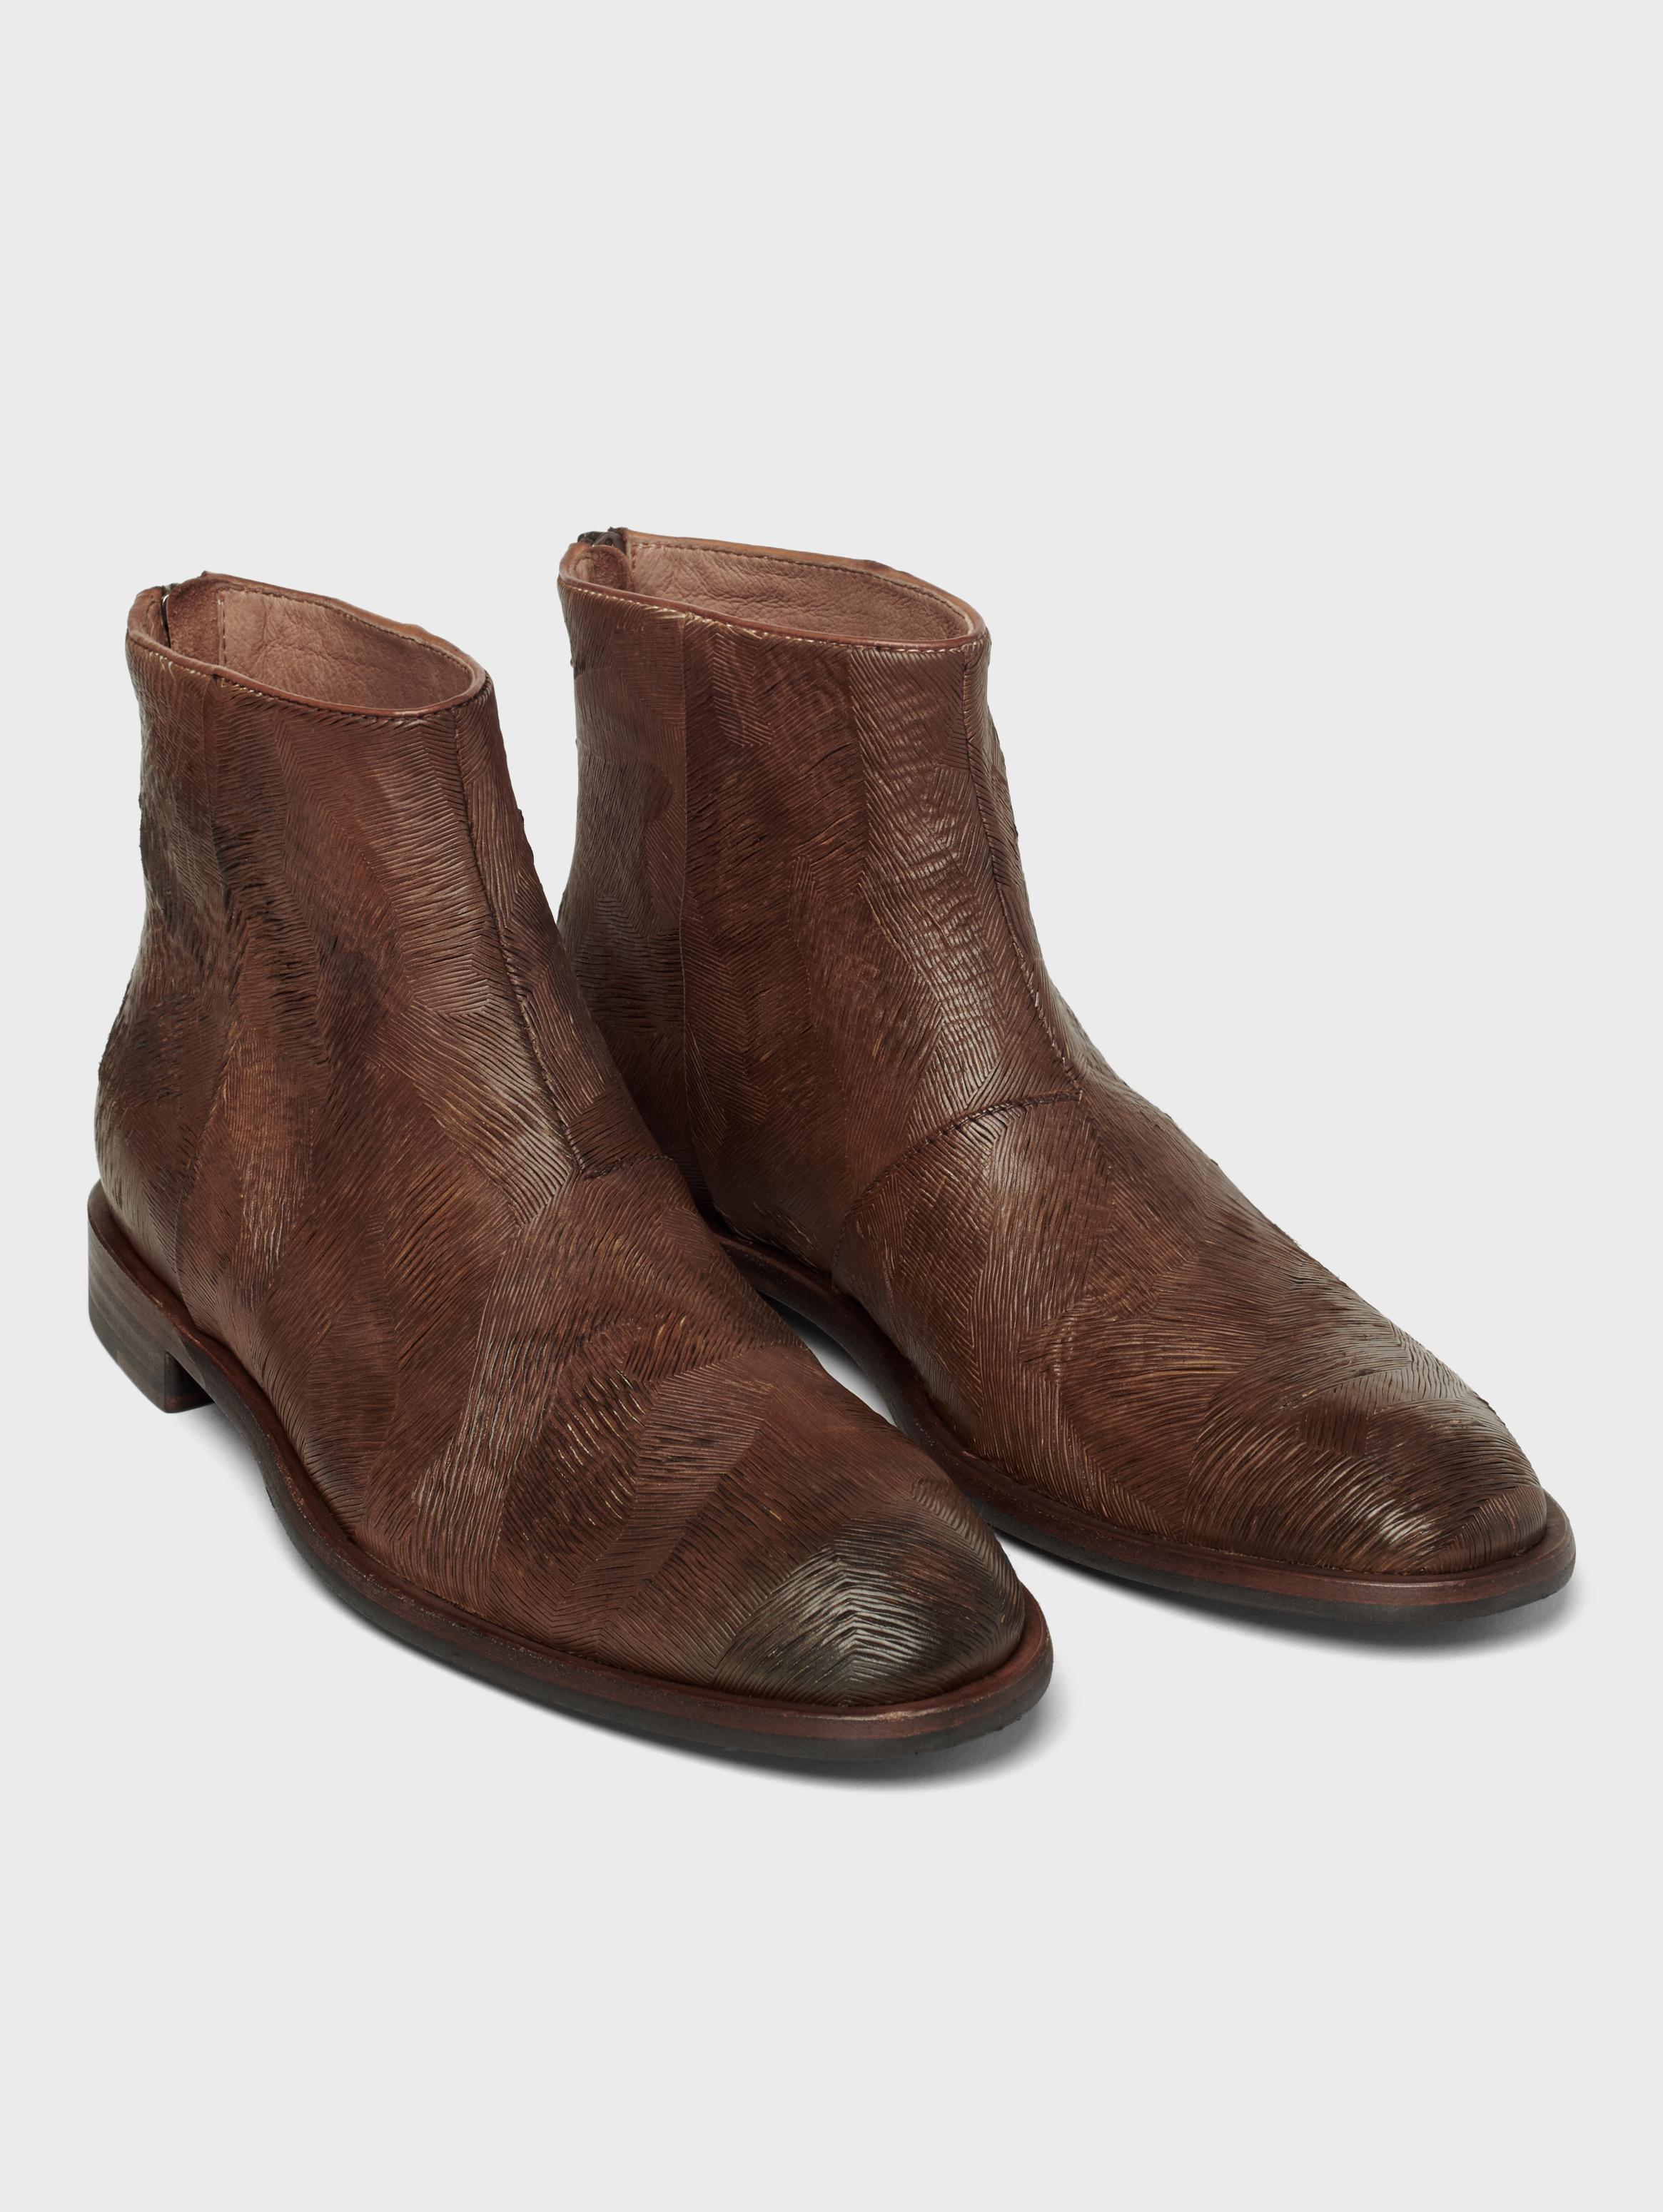 John Varvatos Nyc Back Zip Boots Mocha